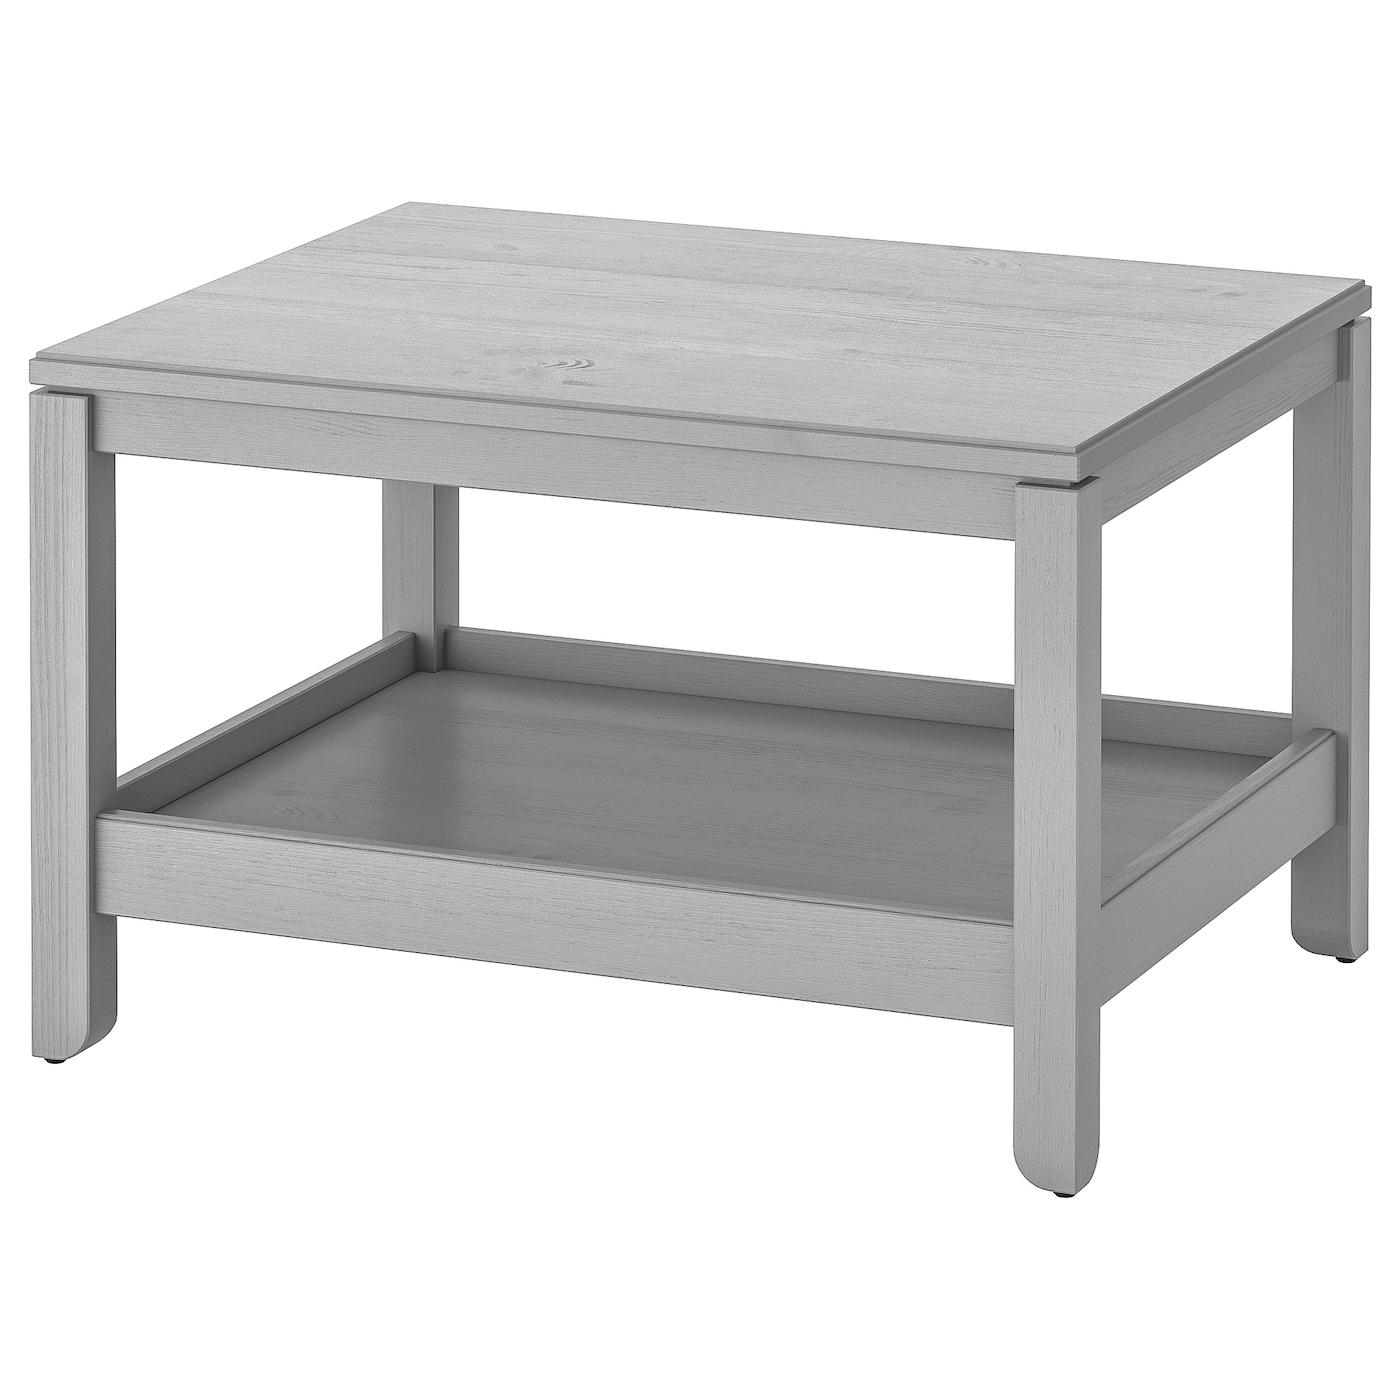 IKEA HAVSTA Stolik, szary, 75x60 cm